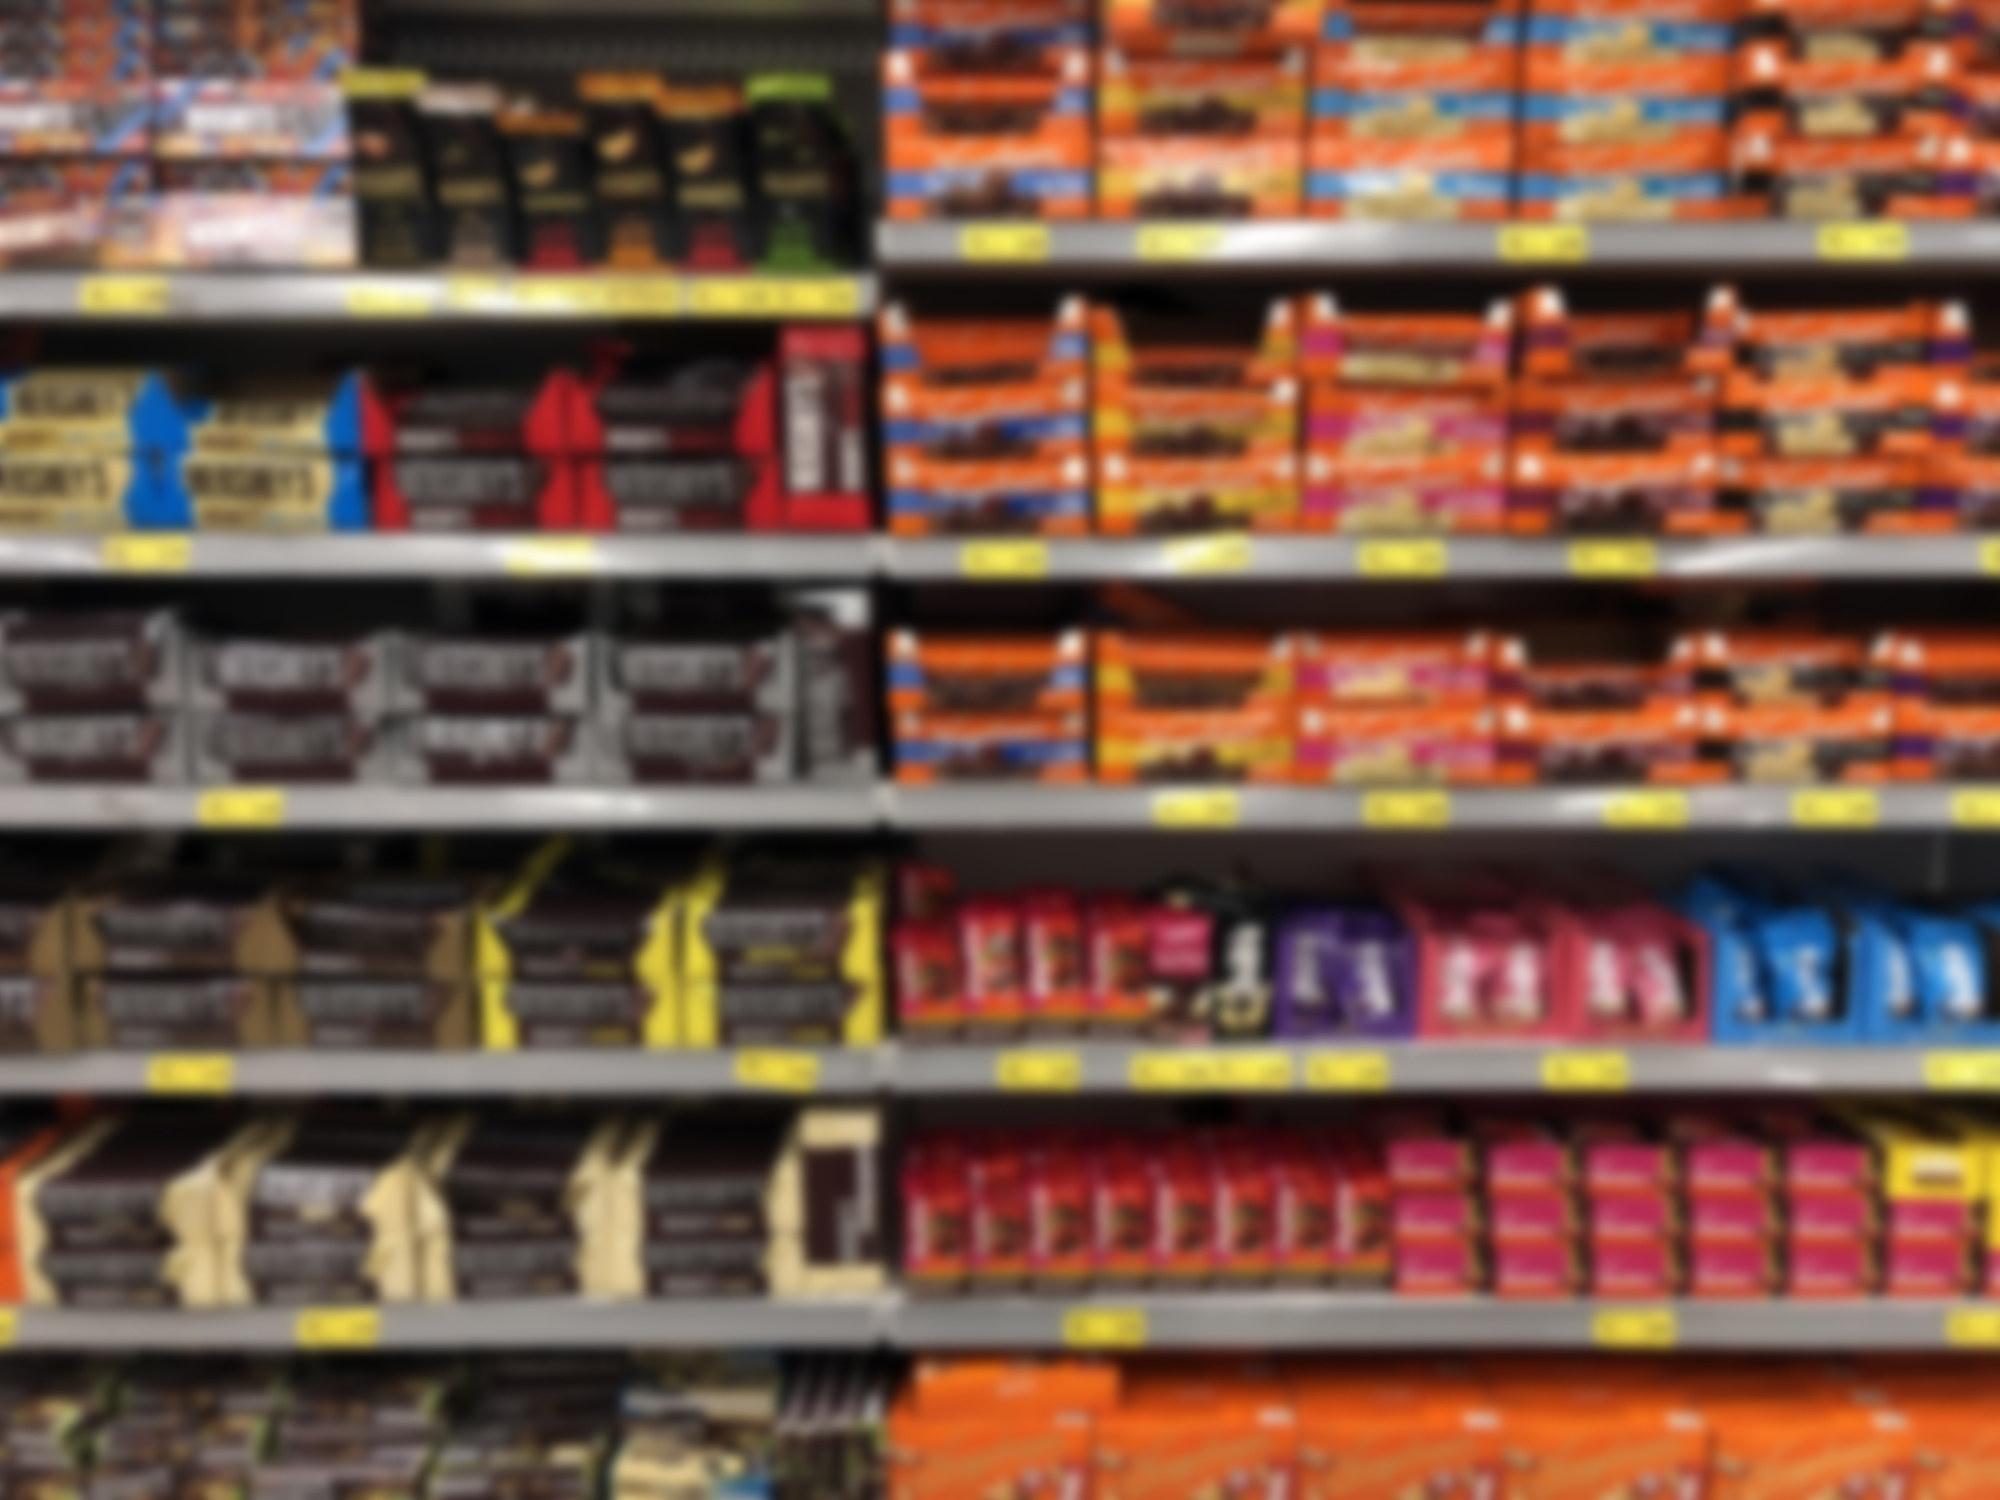 A shelf full of candy.